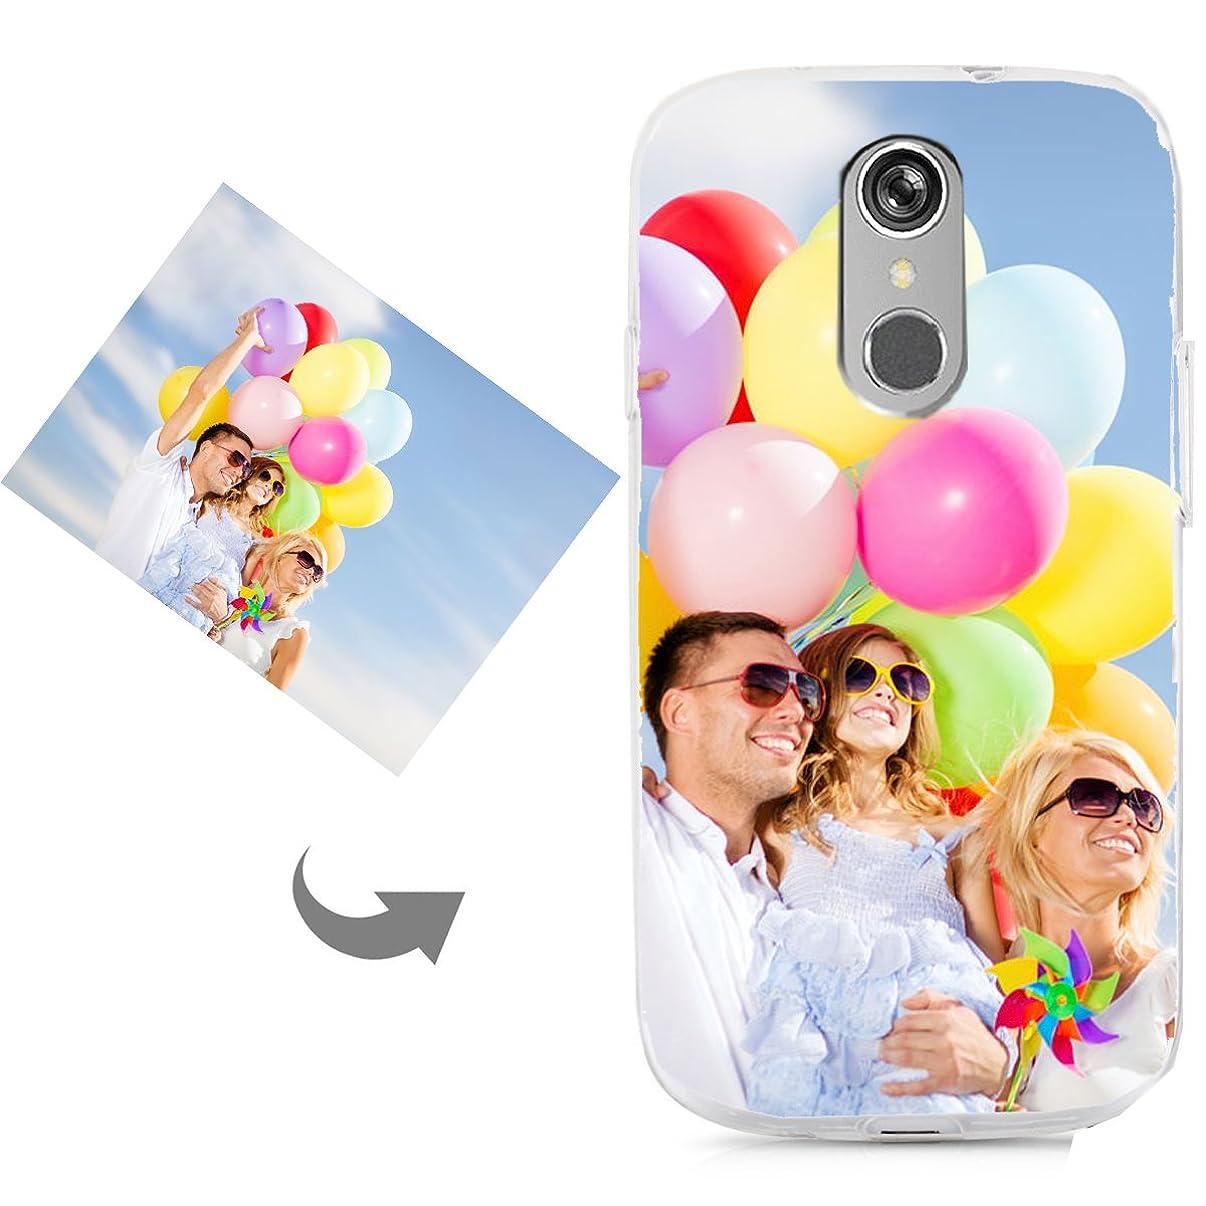 Custom Phone Case,Personalized Customized Phone Case for LG K4/K5/K8/K10/K20 Plus/G4/G5/G6/Q6/V1/V3/V5/V7/V30/Stylo 3, Unique DIY Custom Picture Photo Ultra Thin Soft TPU (Stylo 3/Stylo 3+)